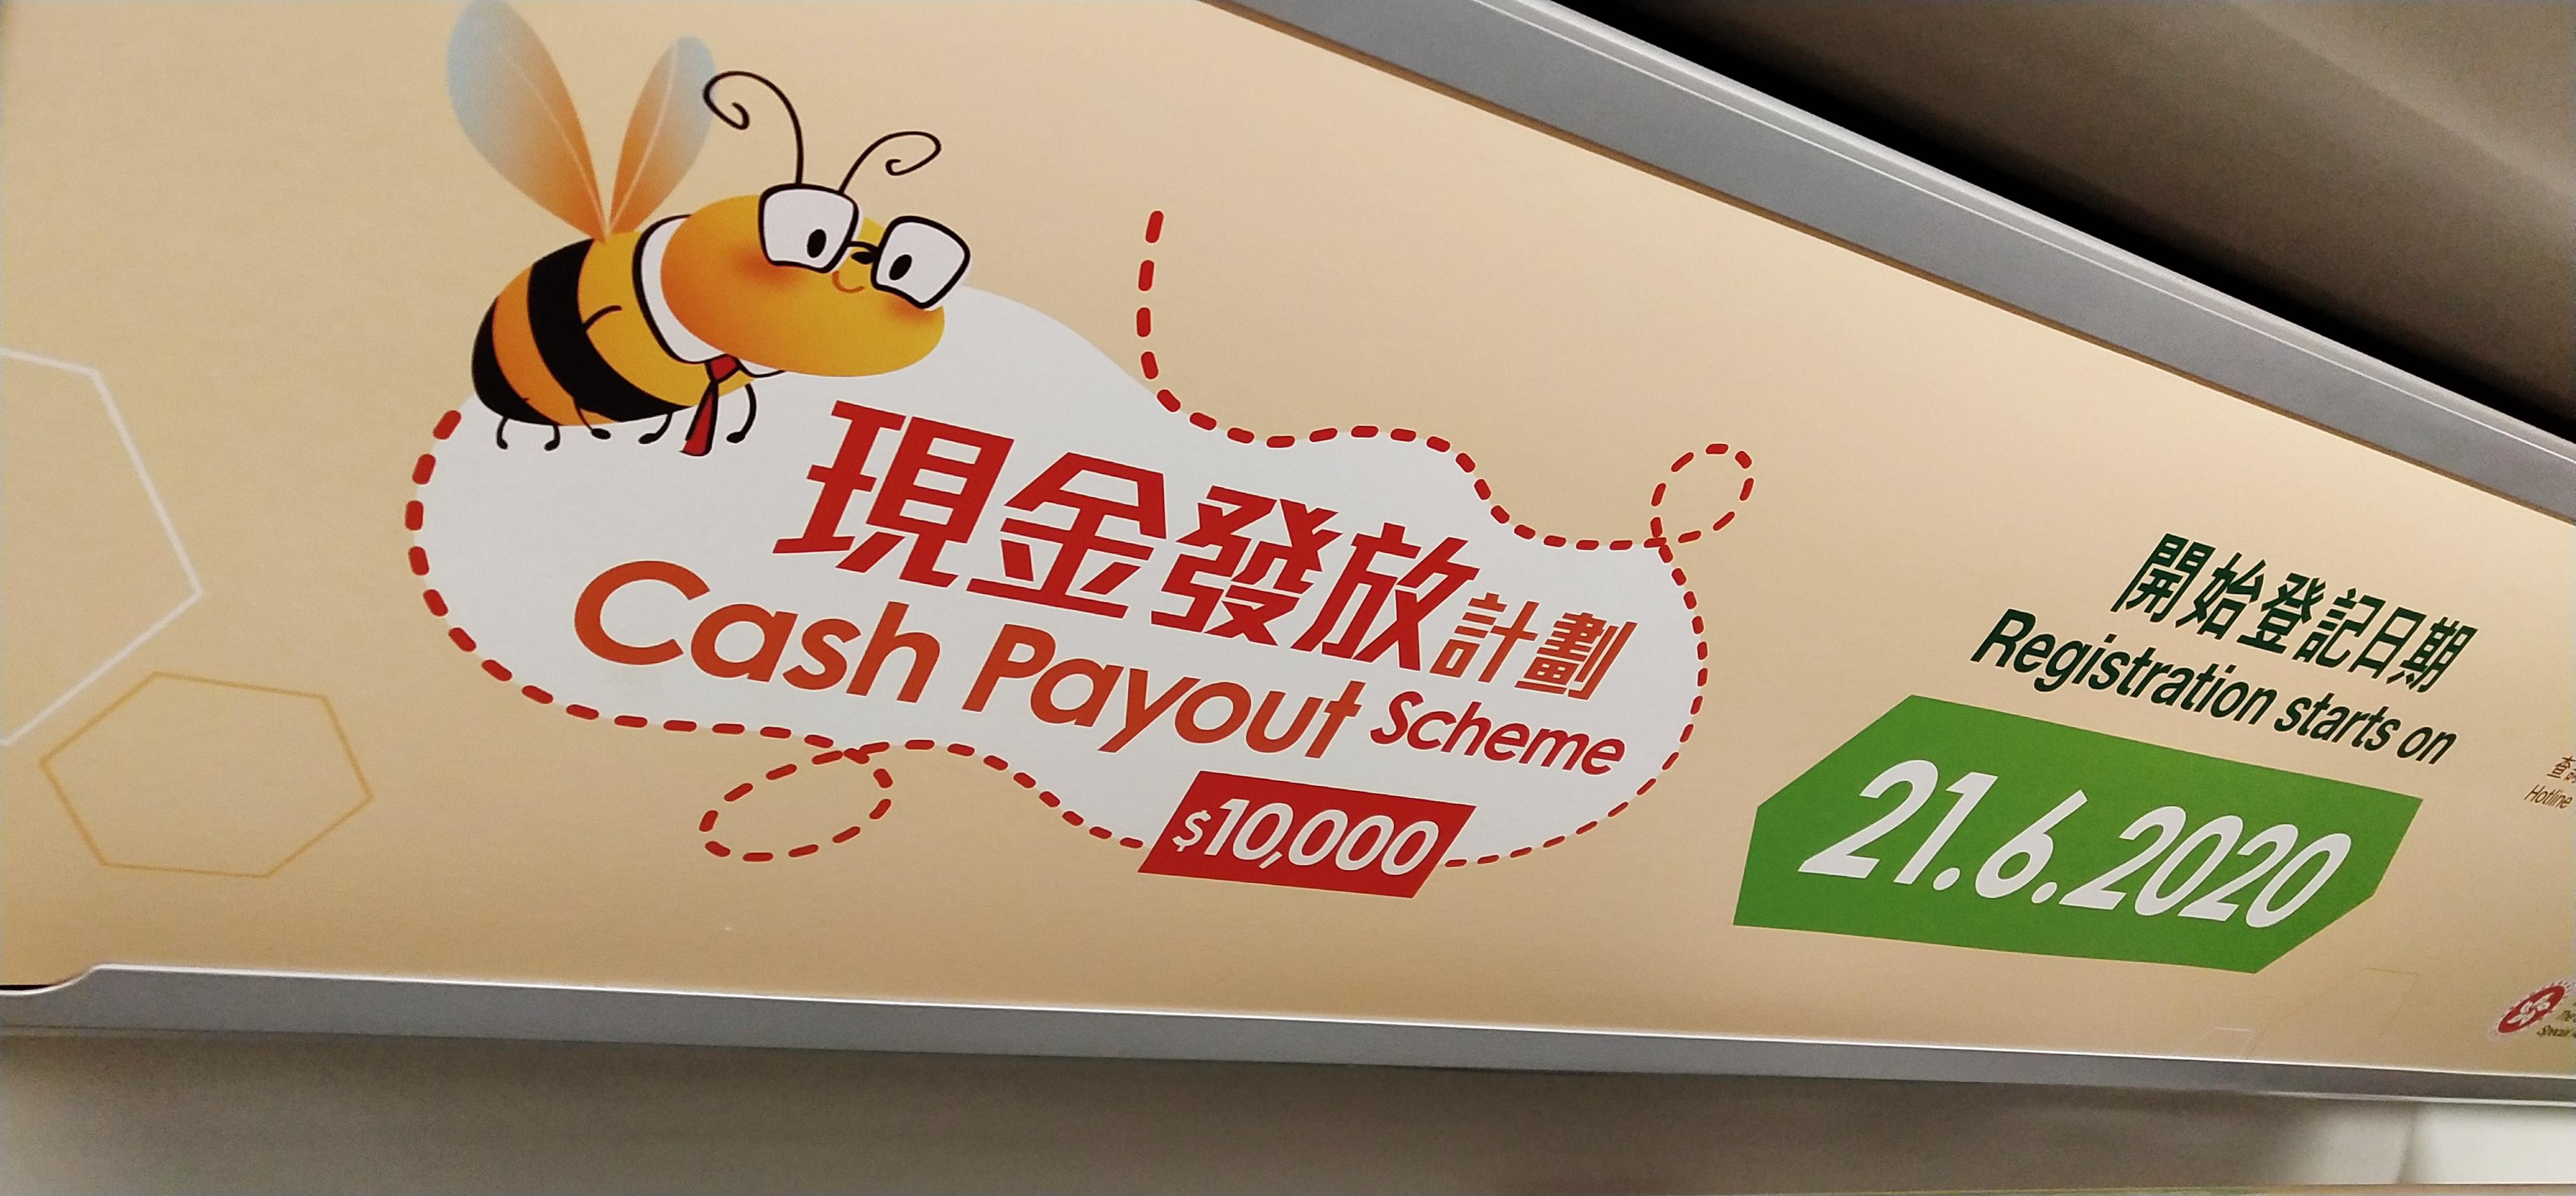 promotion, government, cash payout scheme